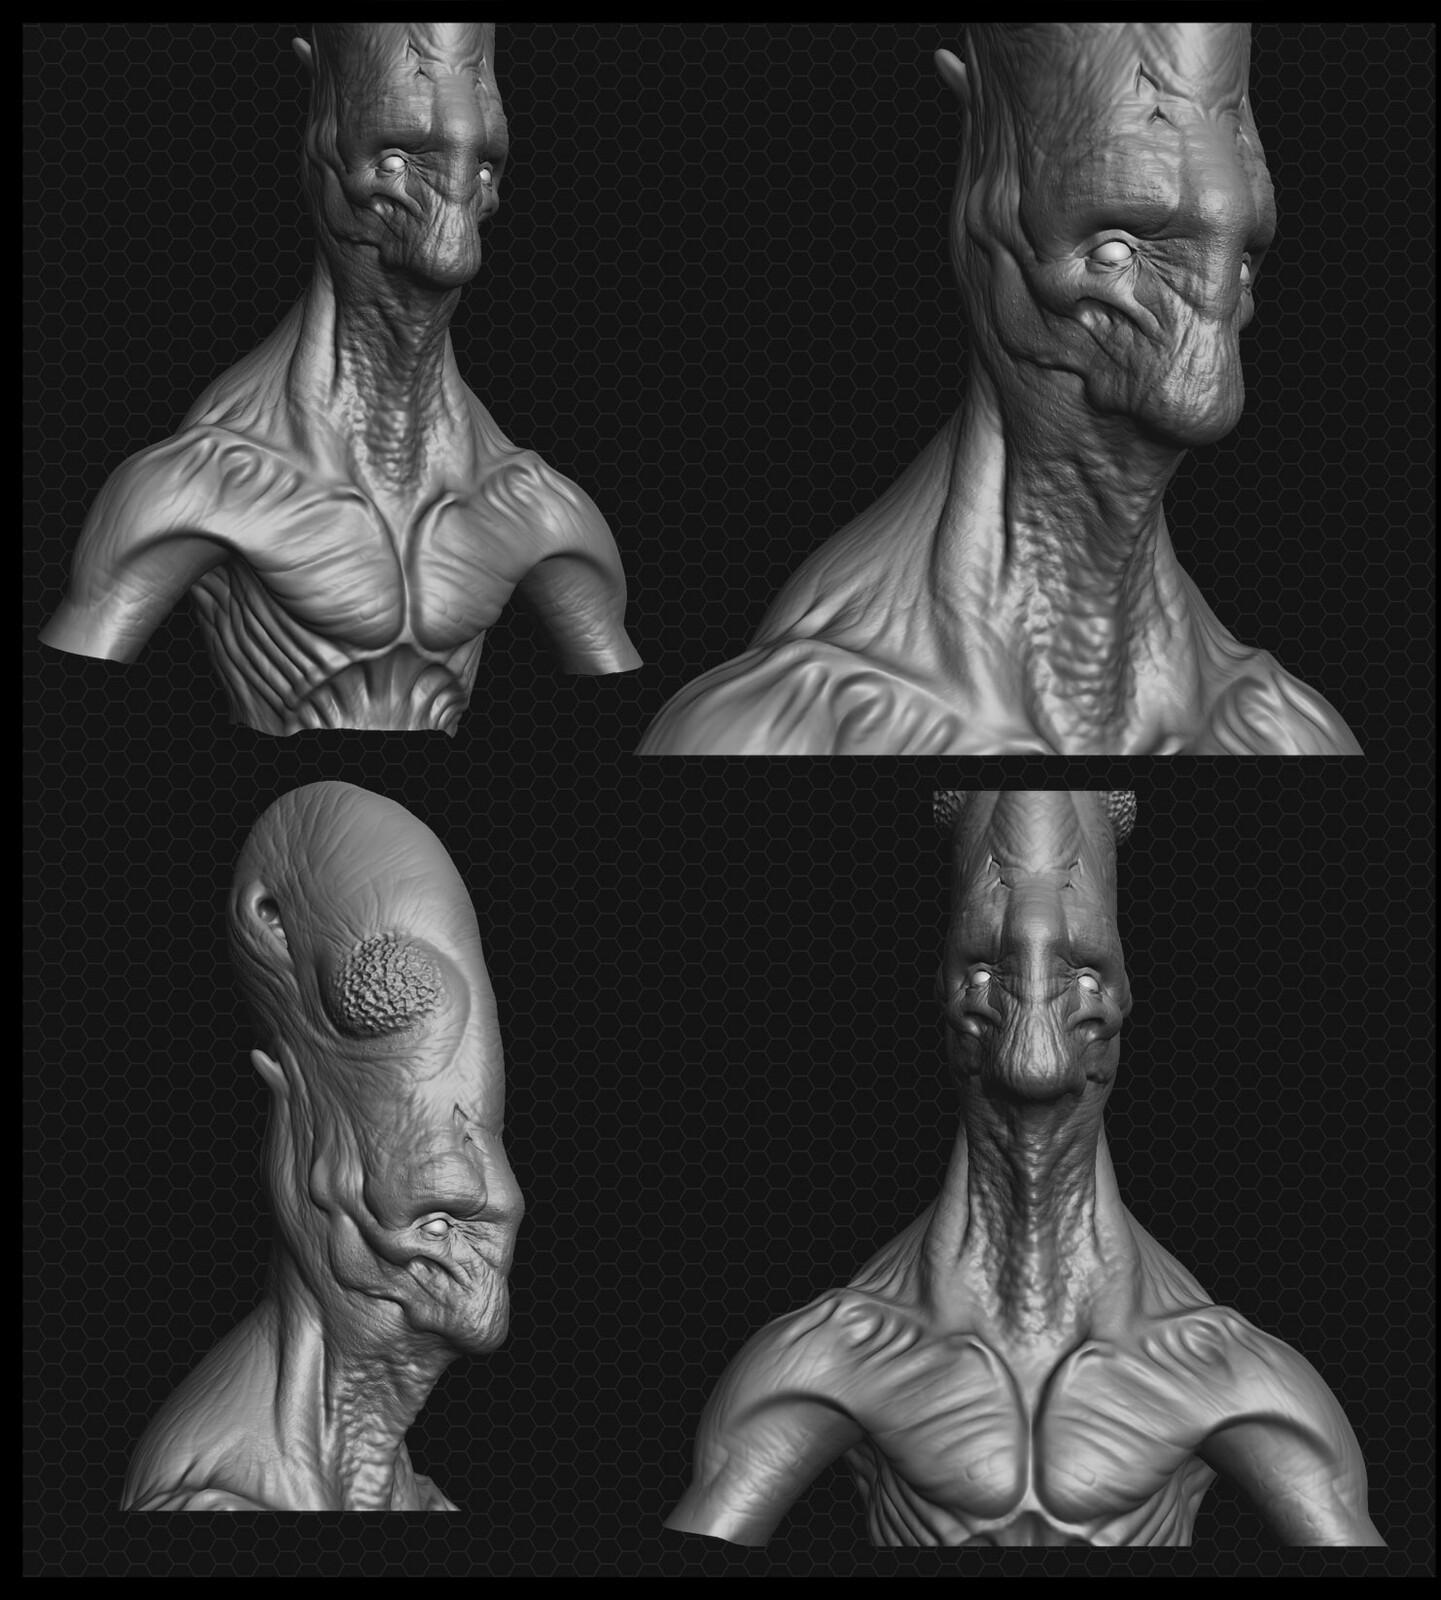 Long head alien. Aliens, Independence Day, Starcraft, etc.